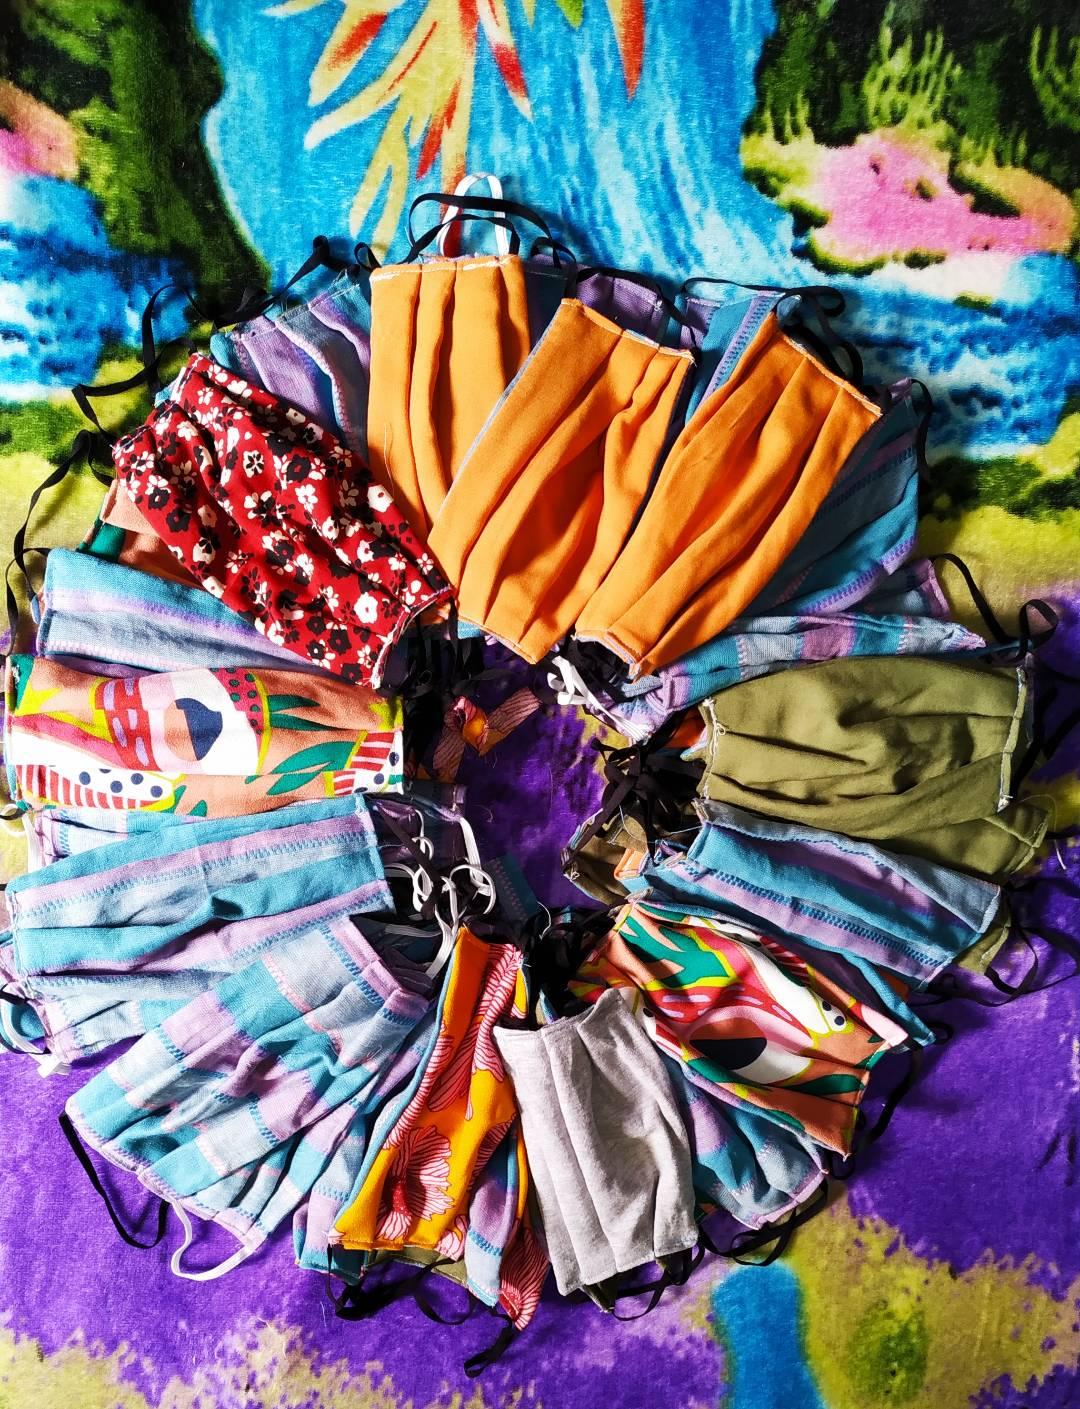 Masks from reclaimed cloth by Valdirene Militão